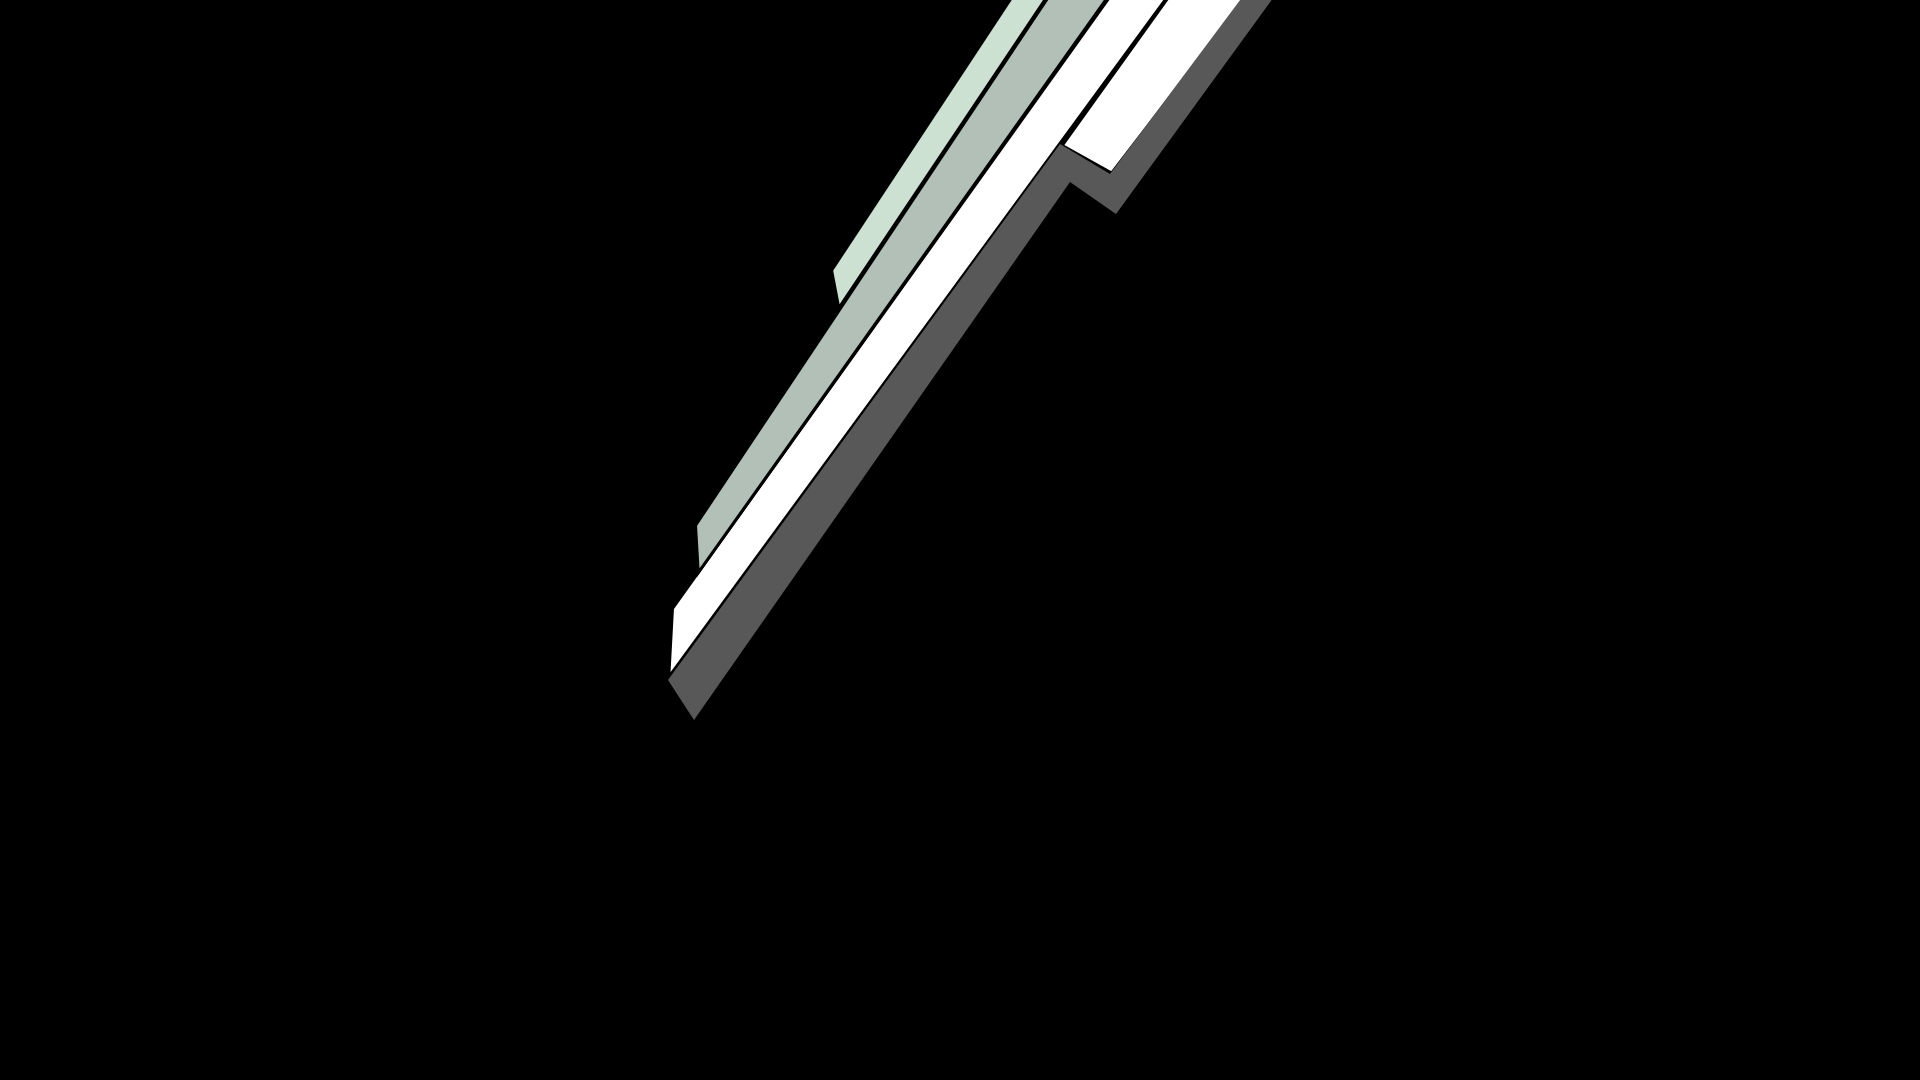 key_first_frame